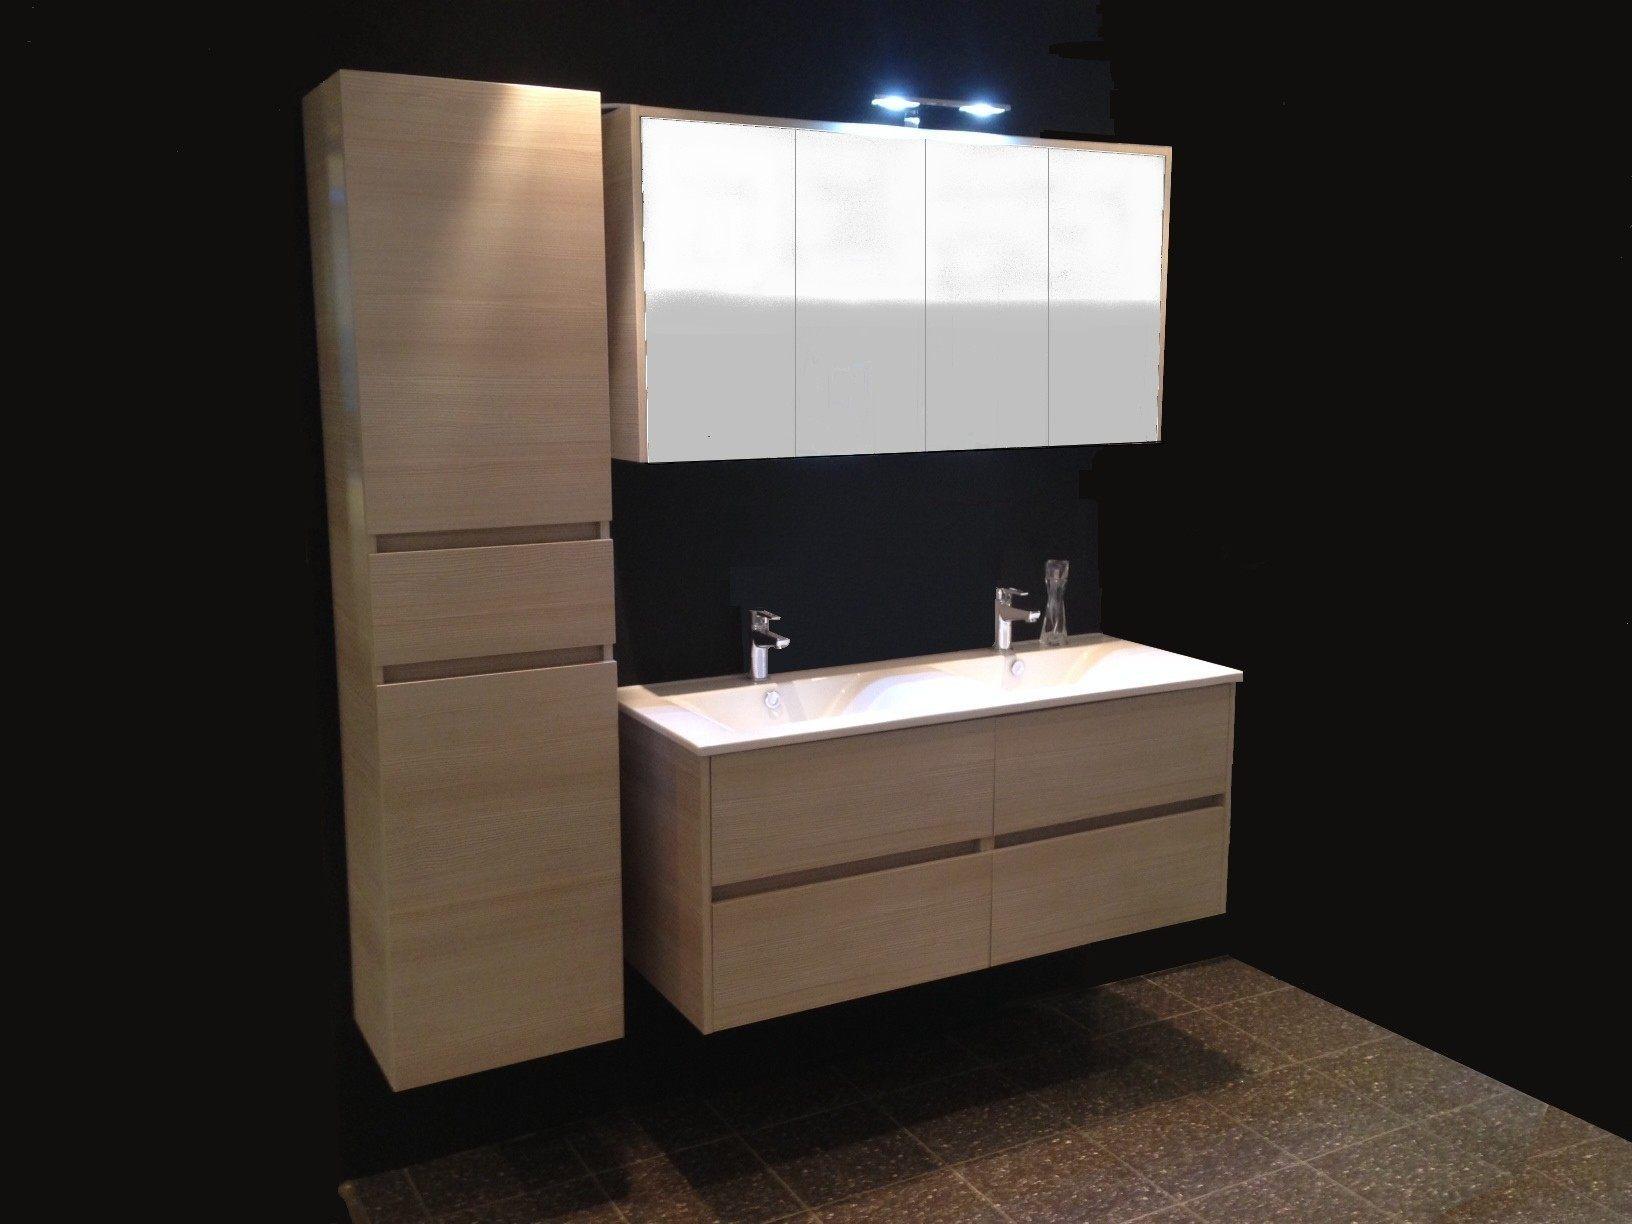 Catalogue Ikea Salle De Bain Inspirant Images Ikea Meuble Lavabo Luxe Rangement sous Evier Ikea Génial I Pinimg